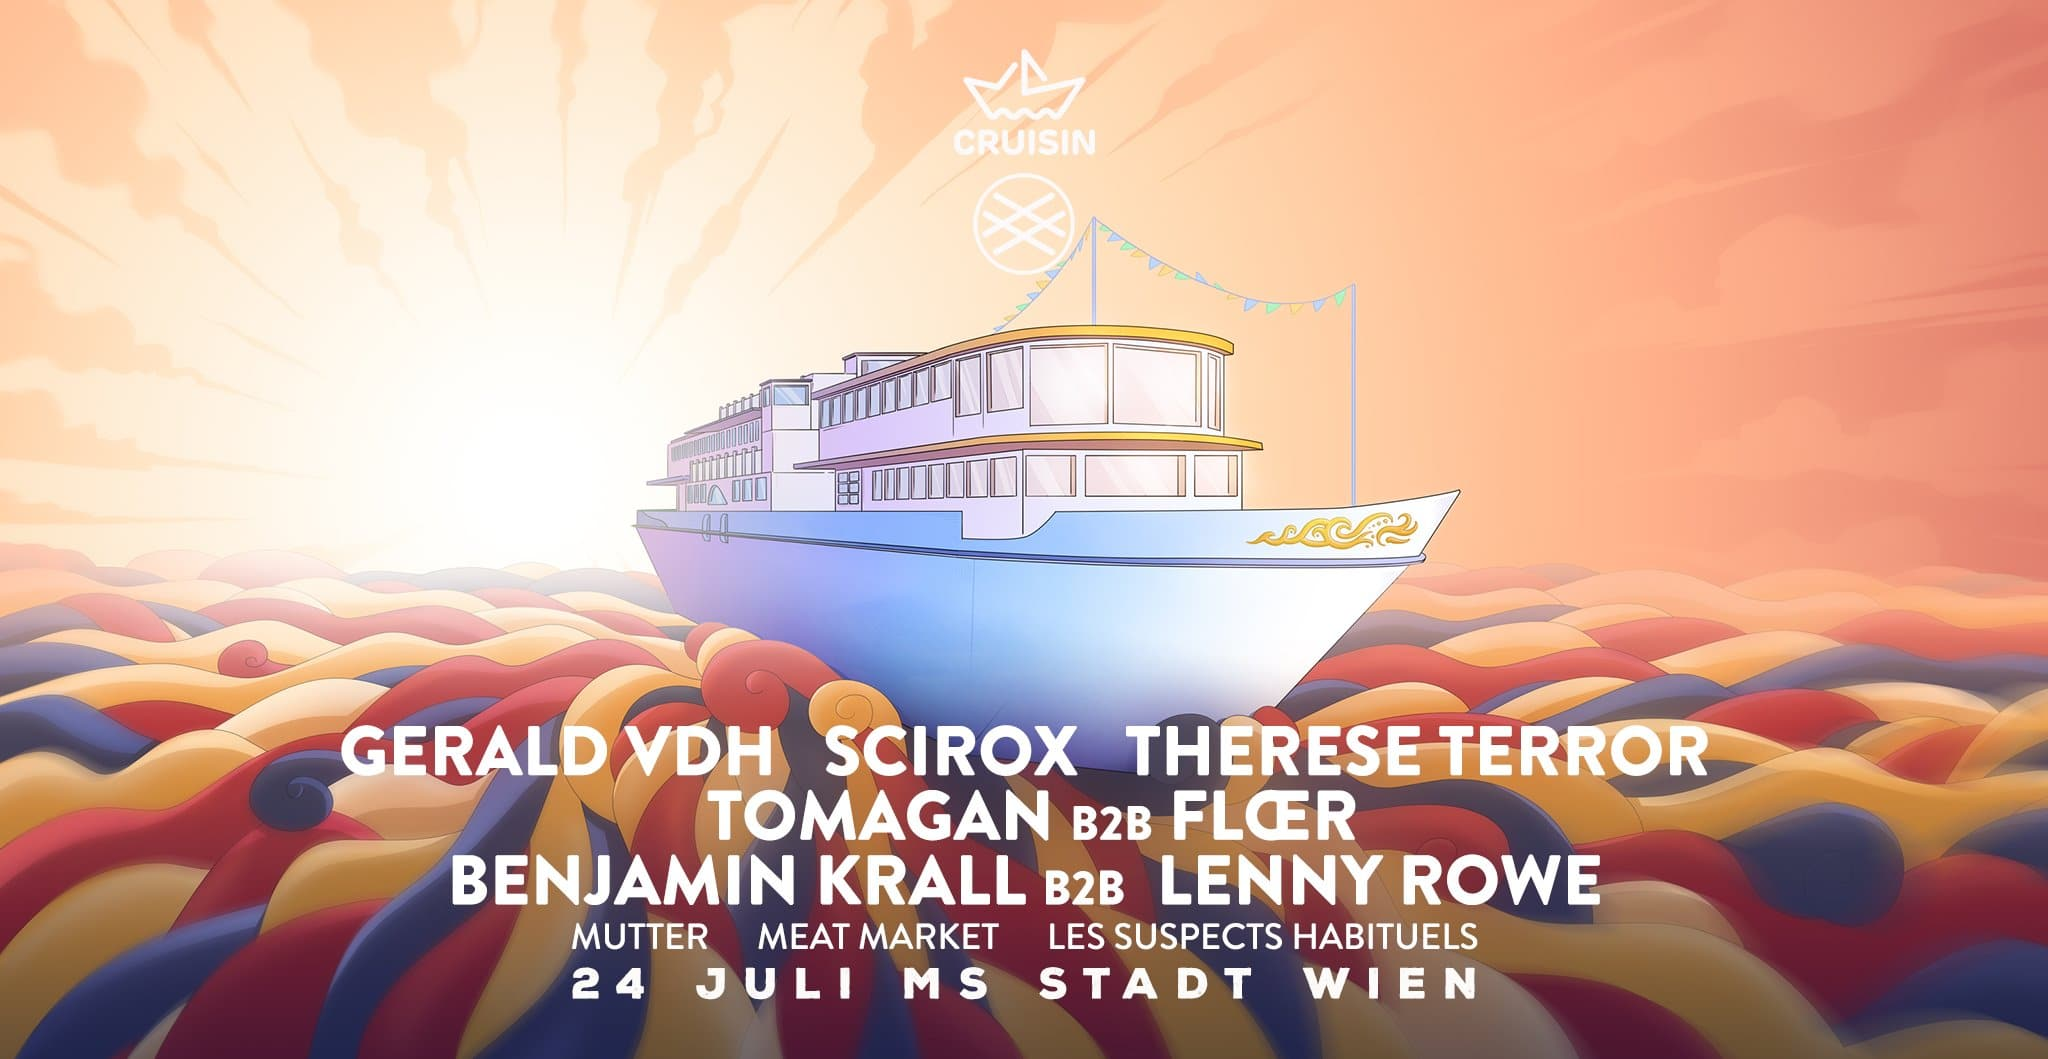 Events Wien: Cruisin w Mutter and LSH 24 Juli